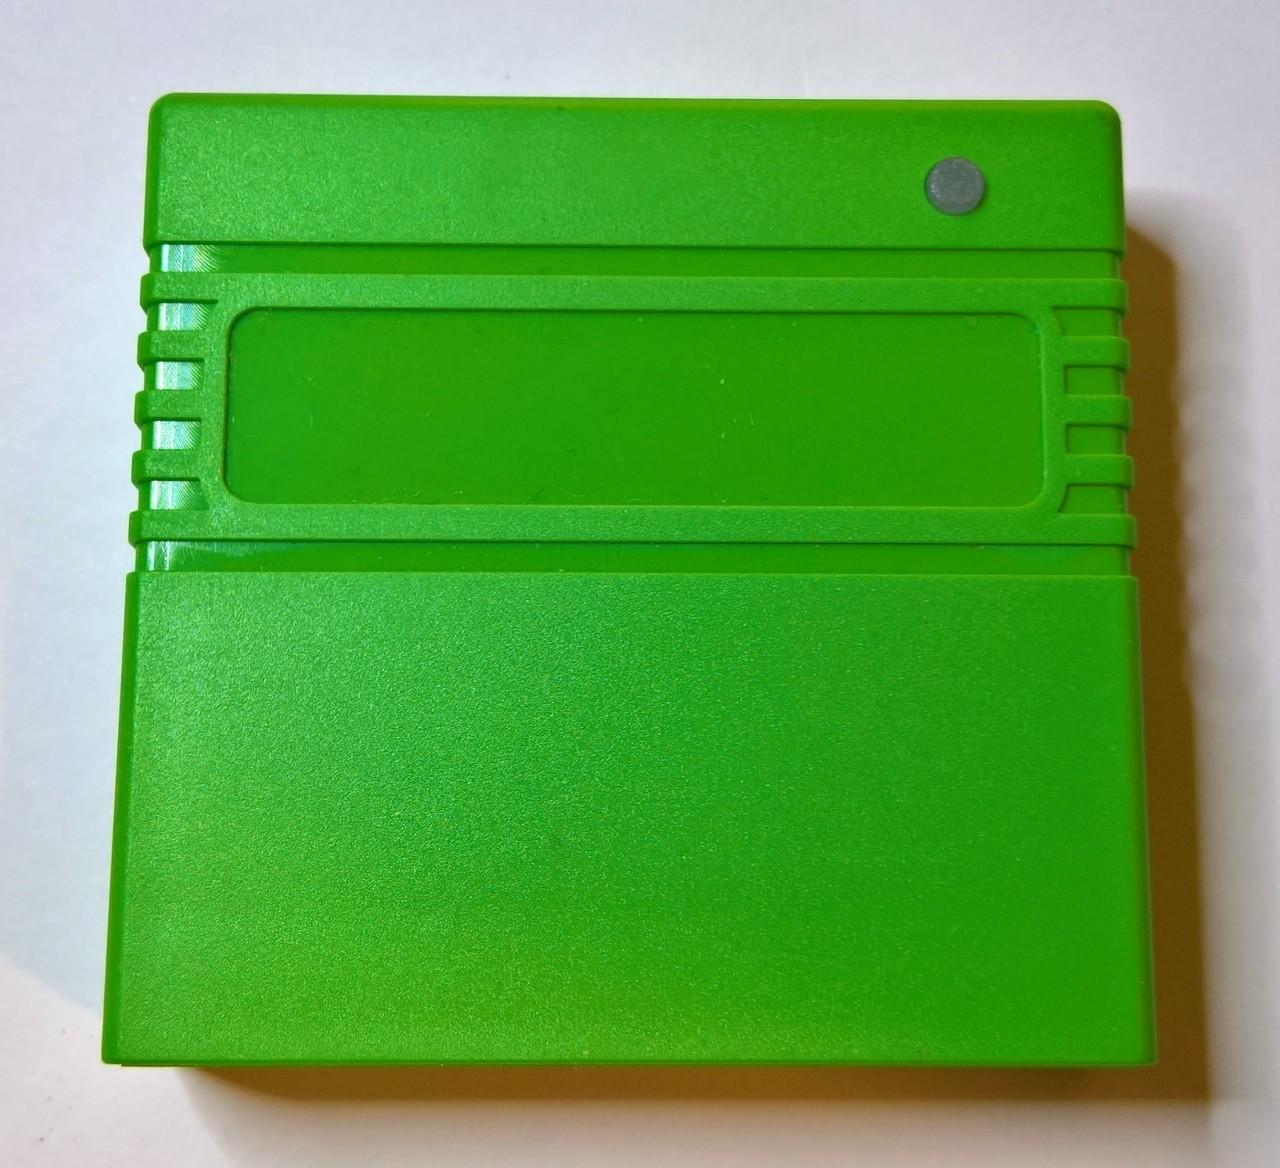 Commodore C64 ROM Cartridge